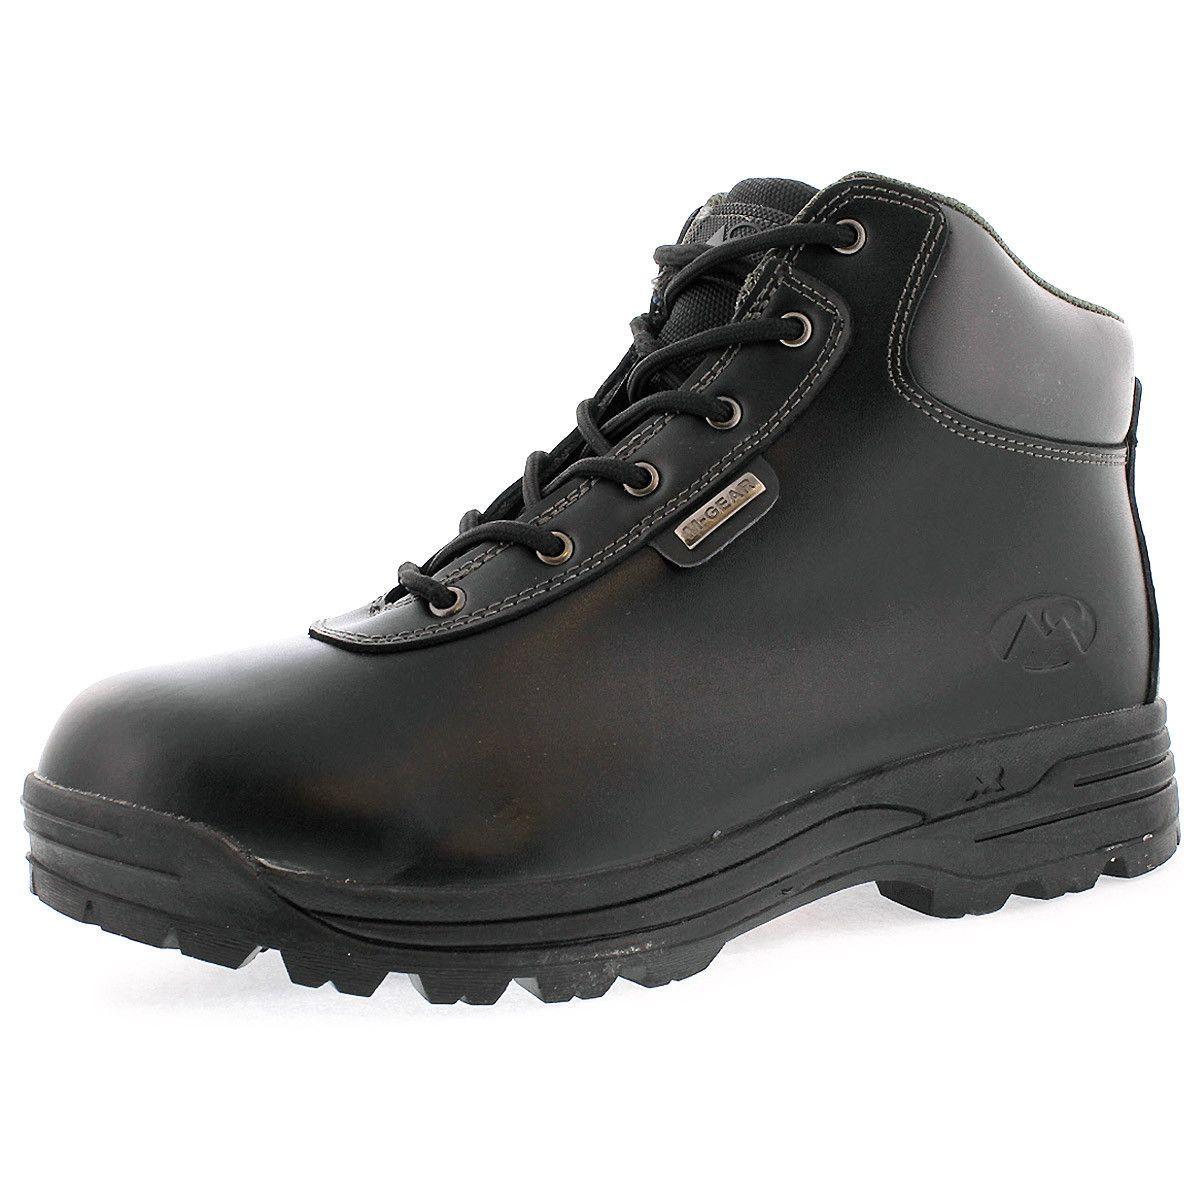 Mountain Gear - Men's 7001 LE 2 Plain Toe Boot - Black